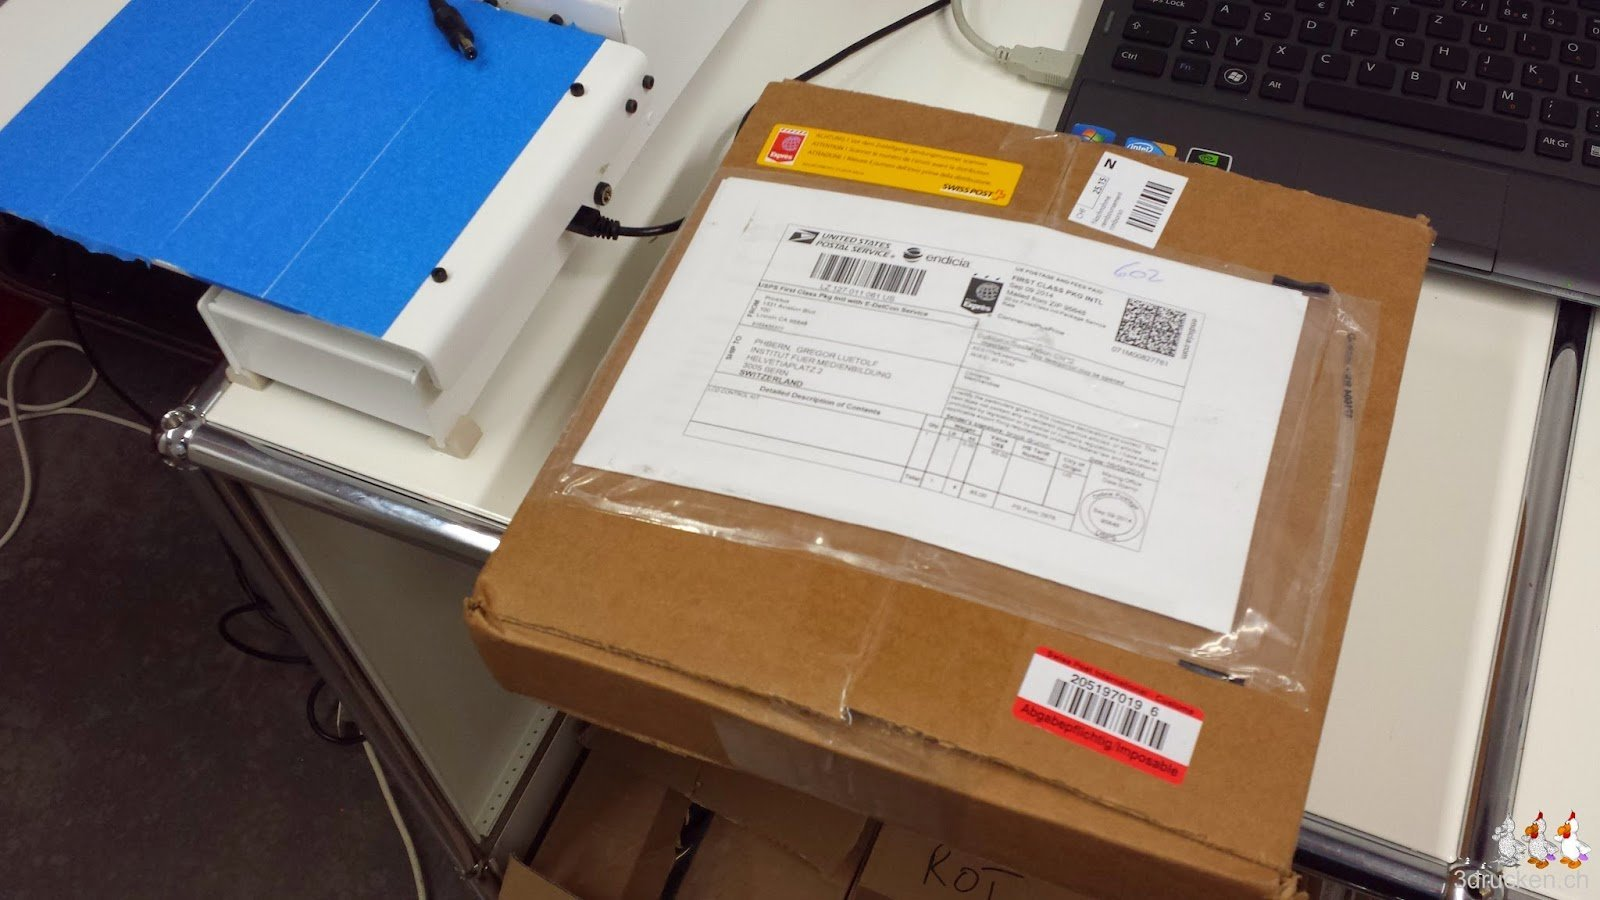 Foto des Pakets mit dem LCD Control Kit für den Printrbot Simple Metal